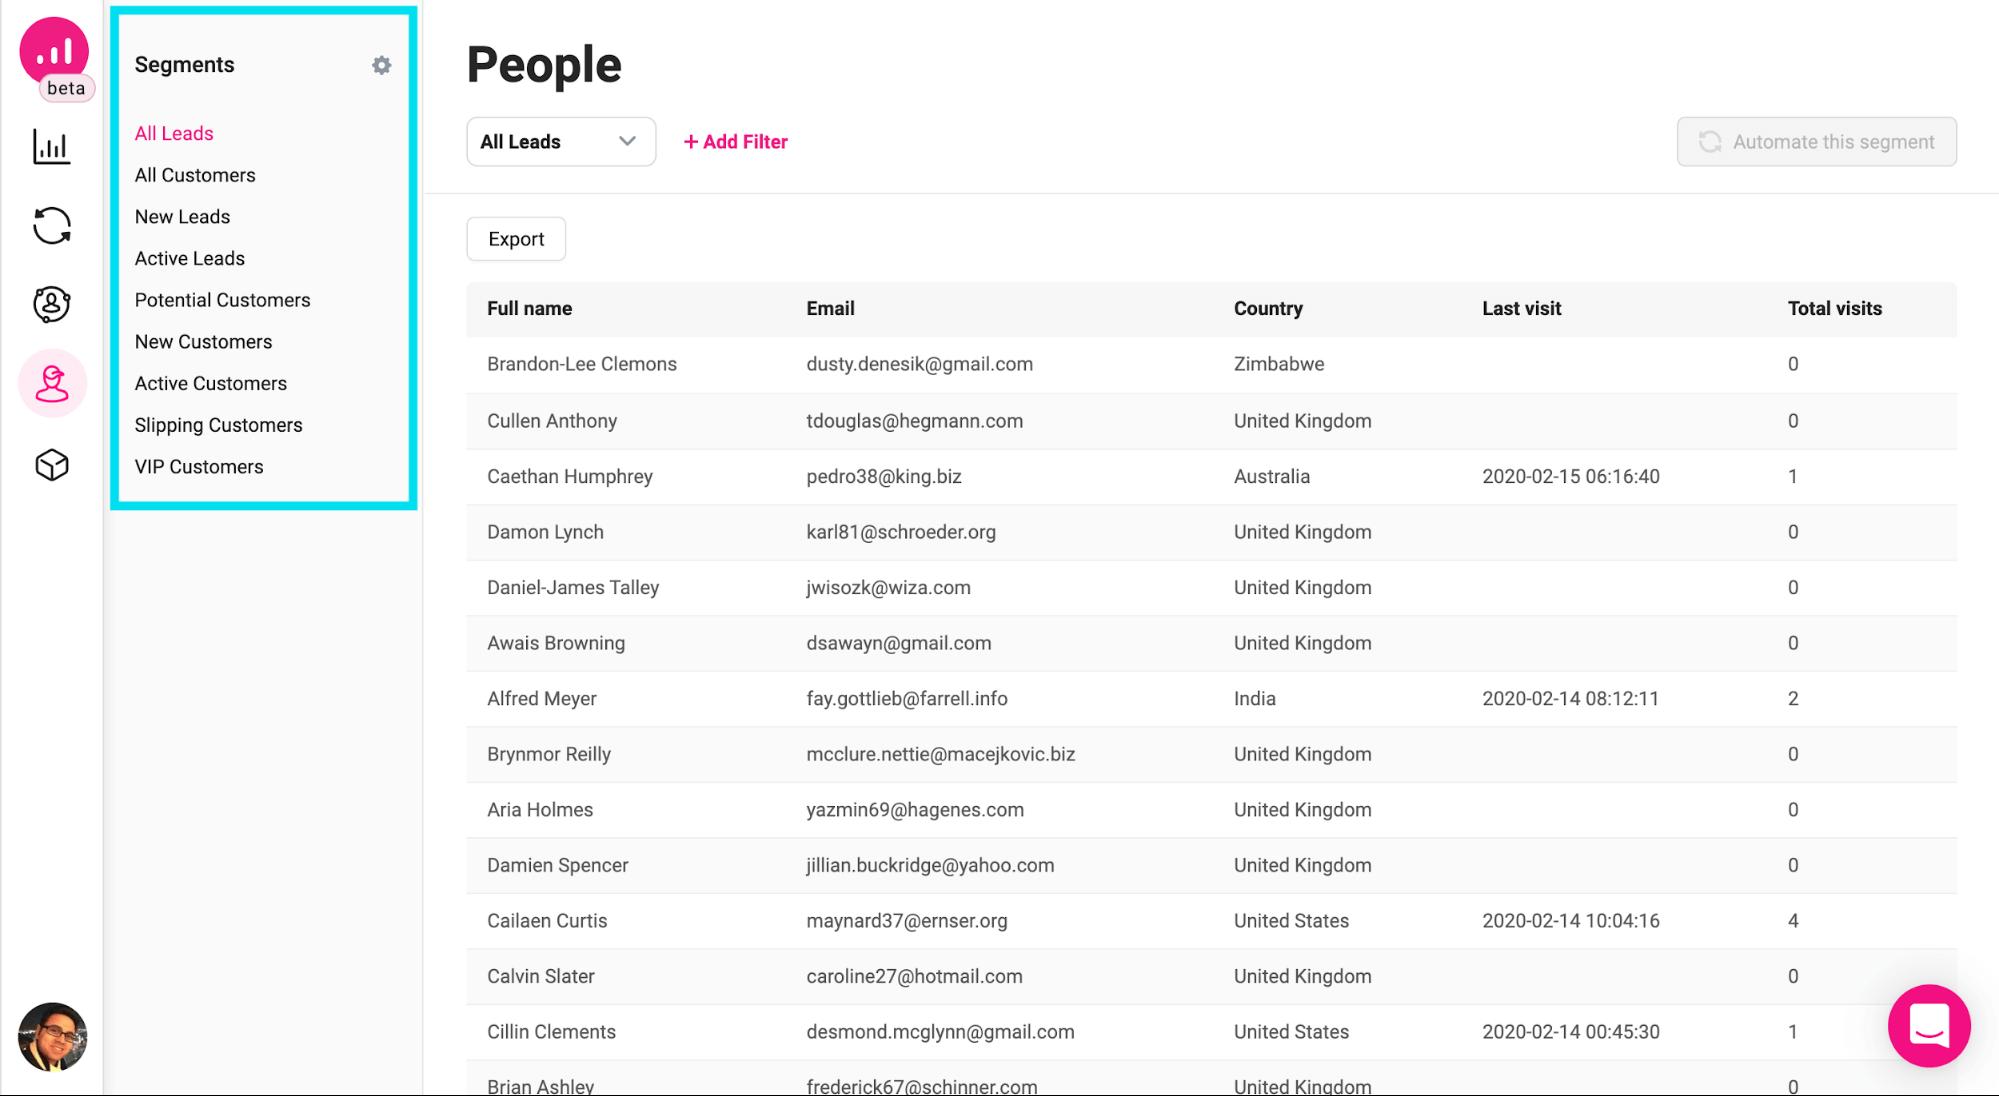 people - default segments